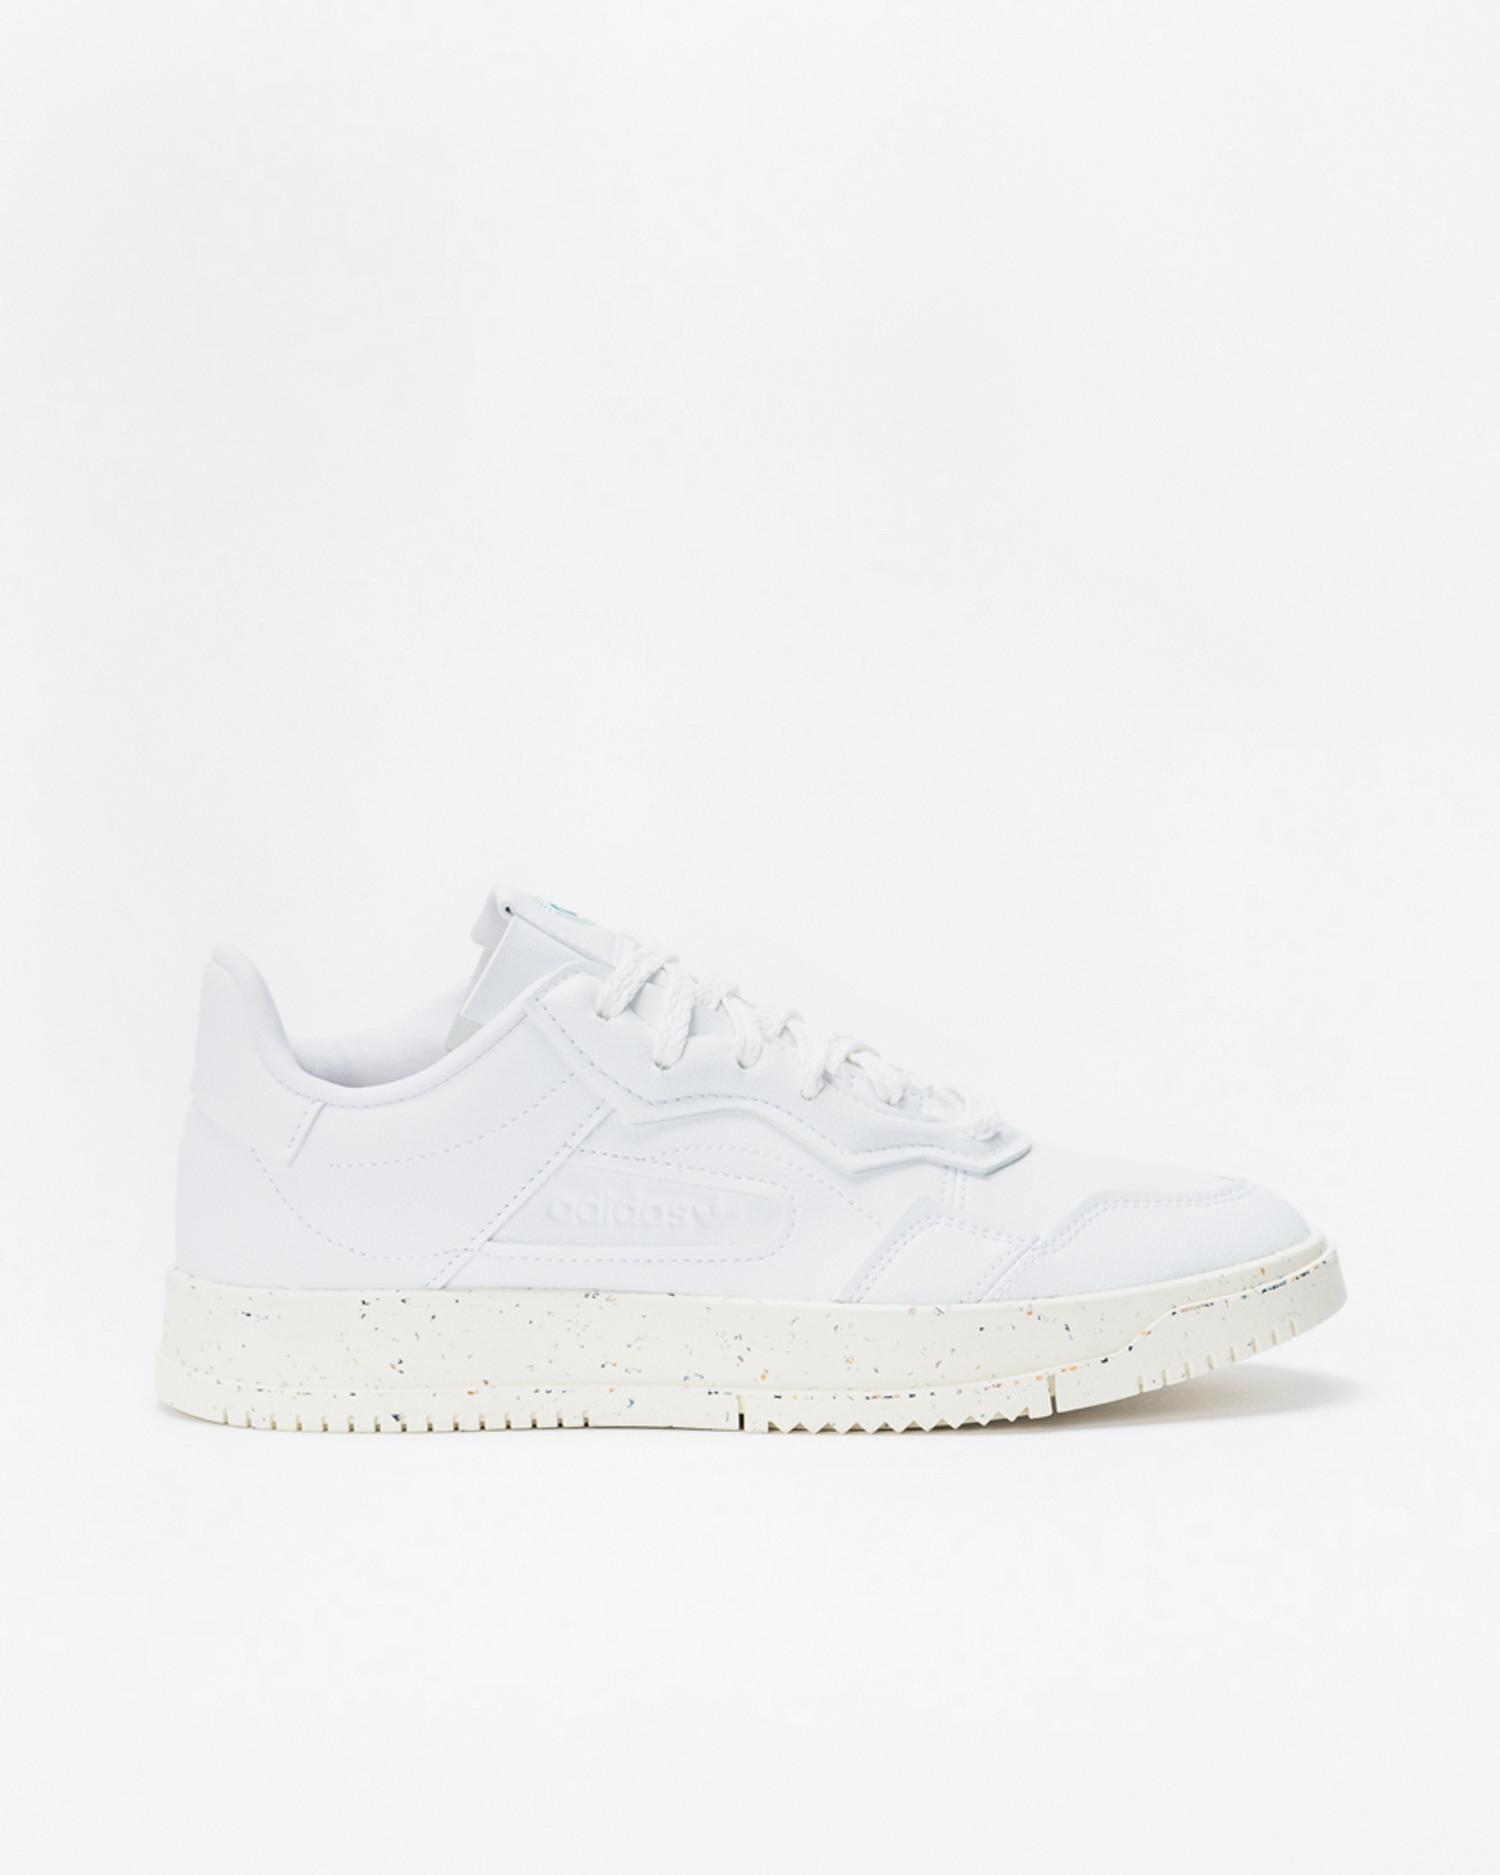 Adidas Sc Premiere Ftwwht/Owhite/Green